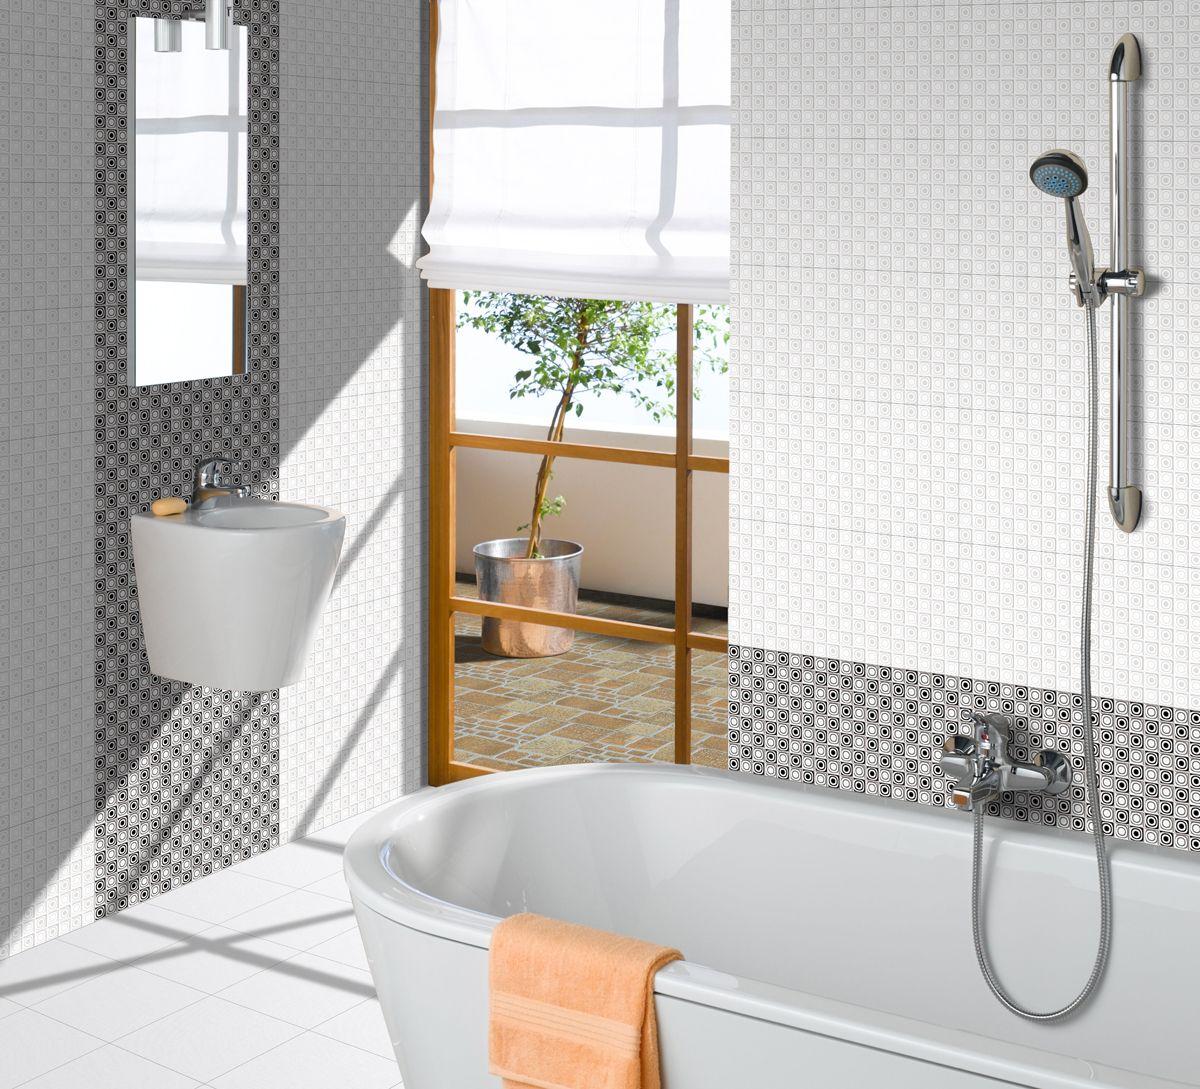 New Designs of Orient Bathroom Tiles - http://www.orientbell.com ...